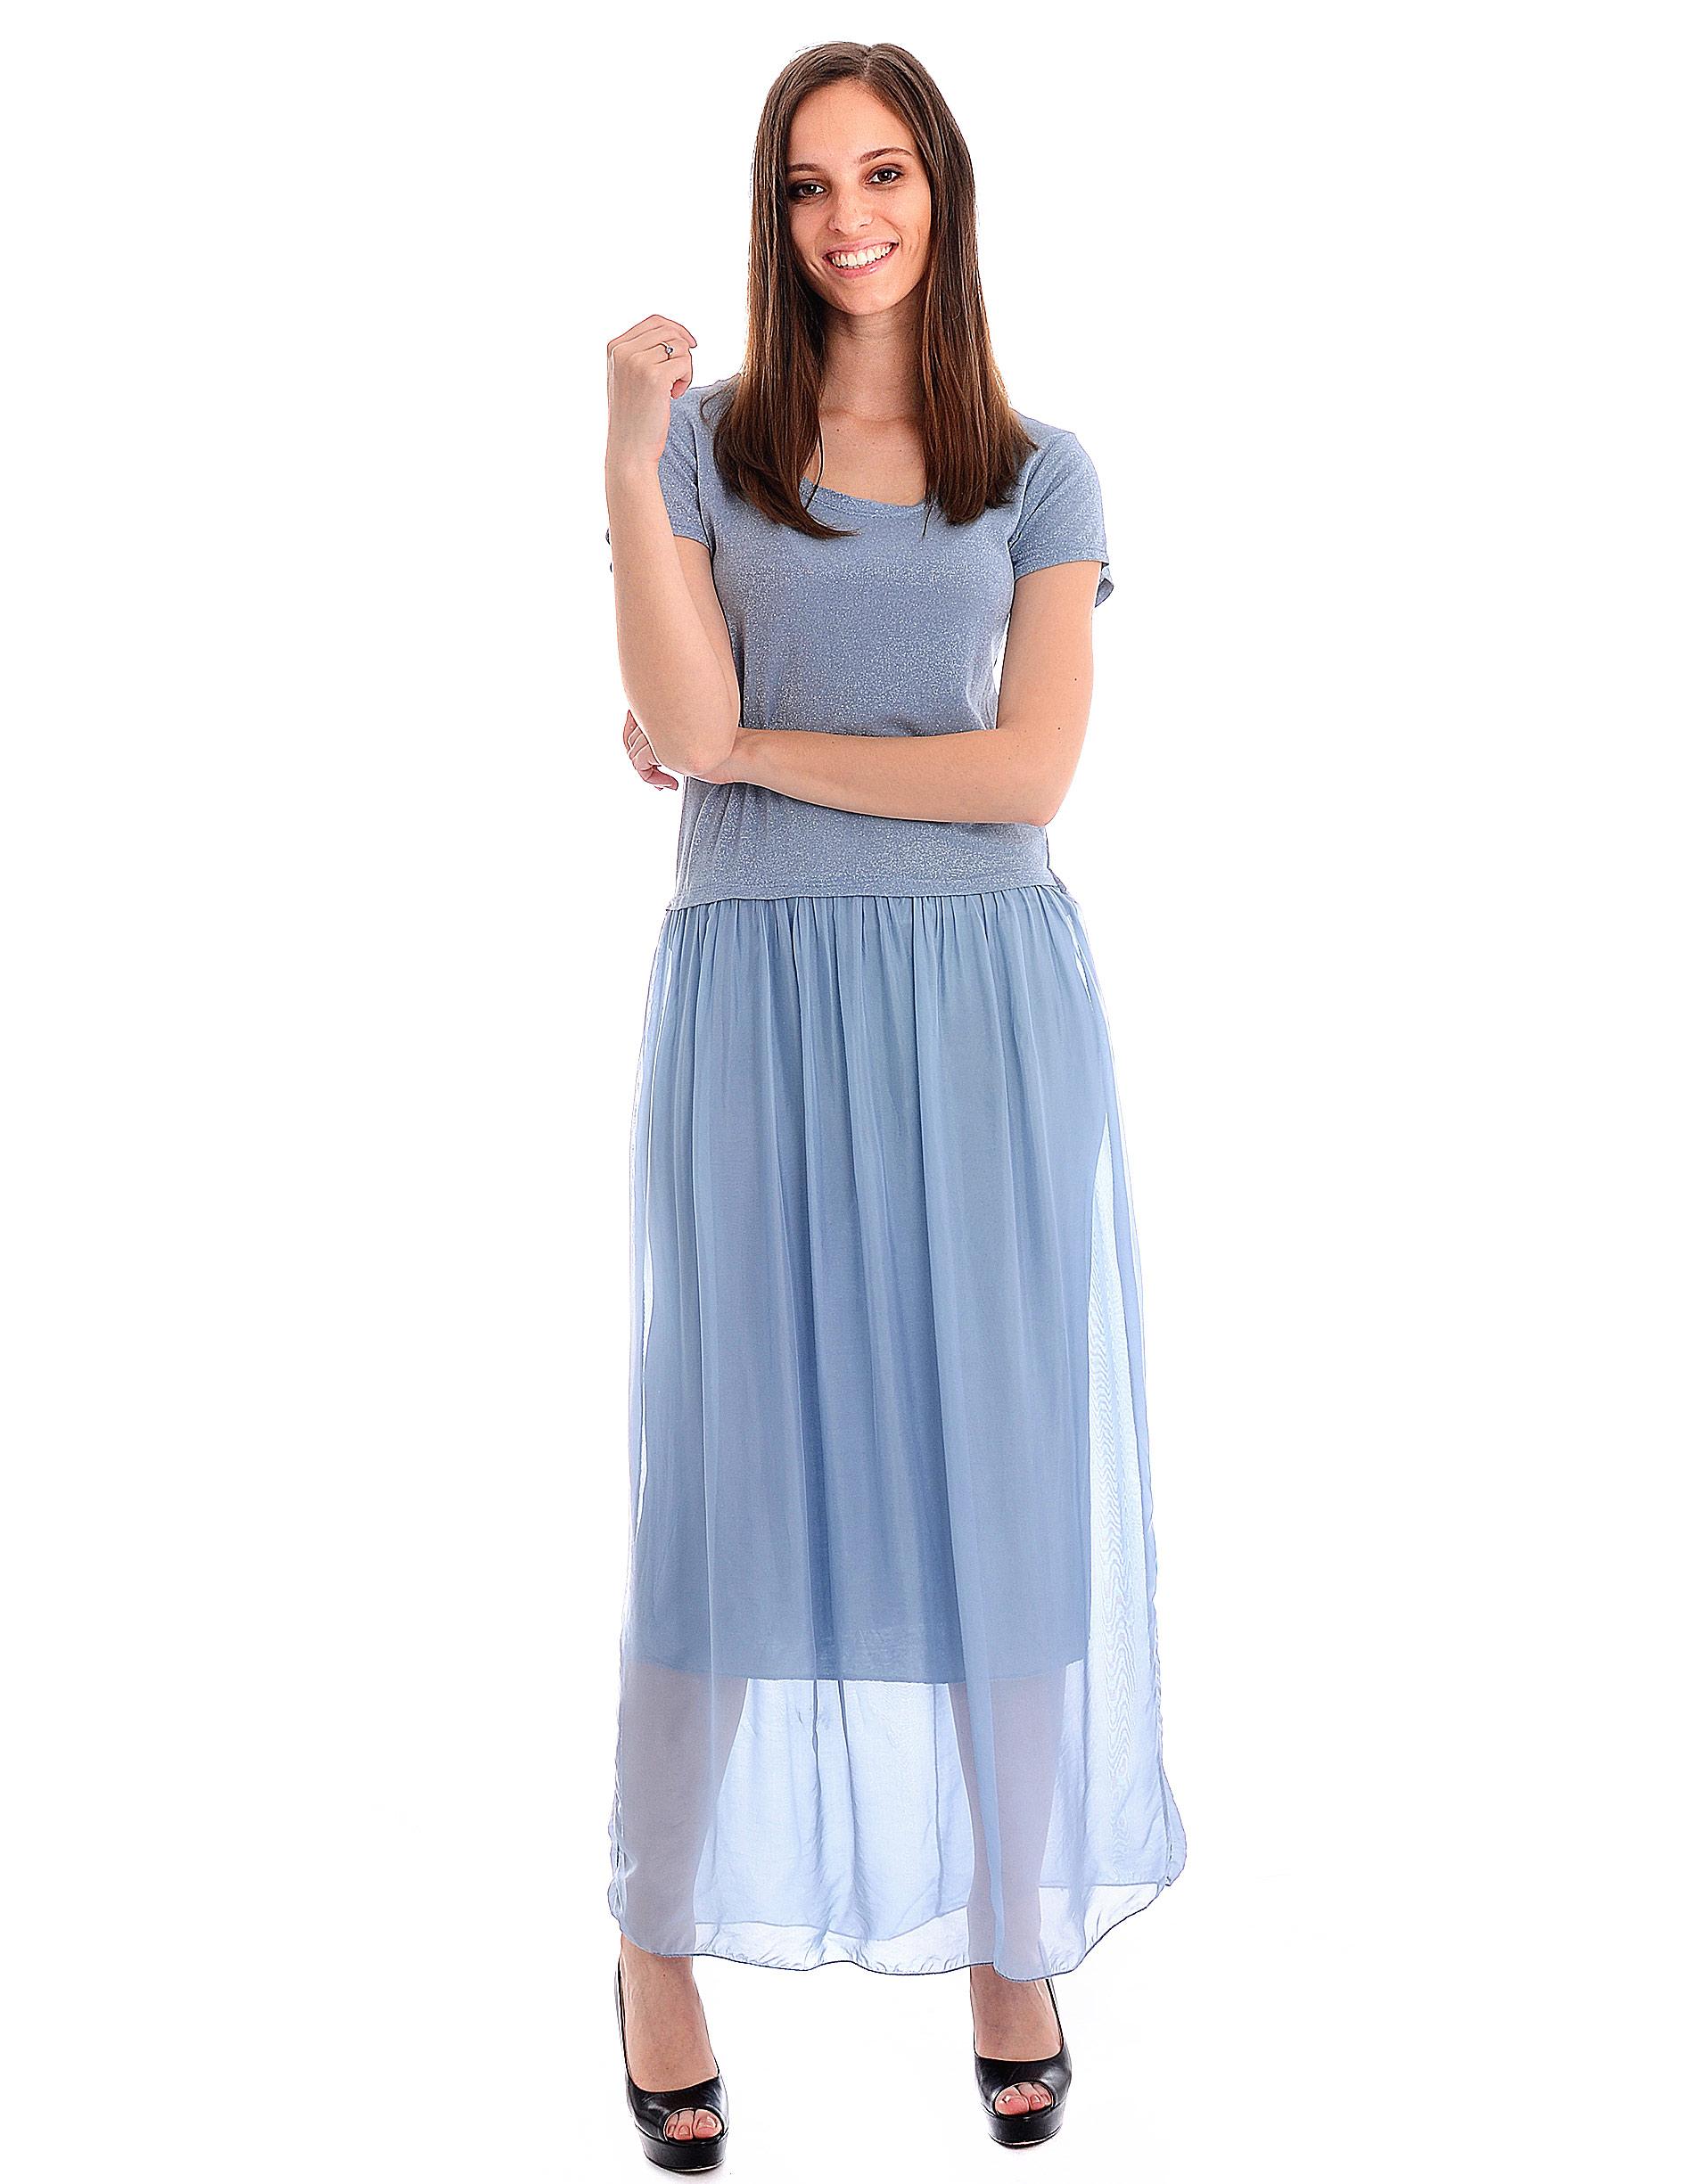 Sukienka - 31-5809 JEANS - Unisono